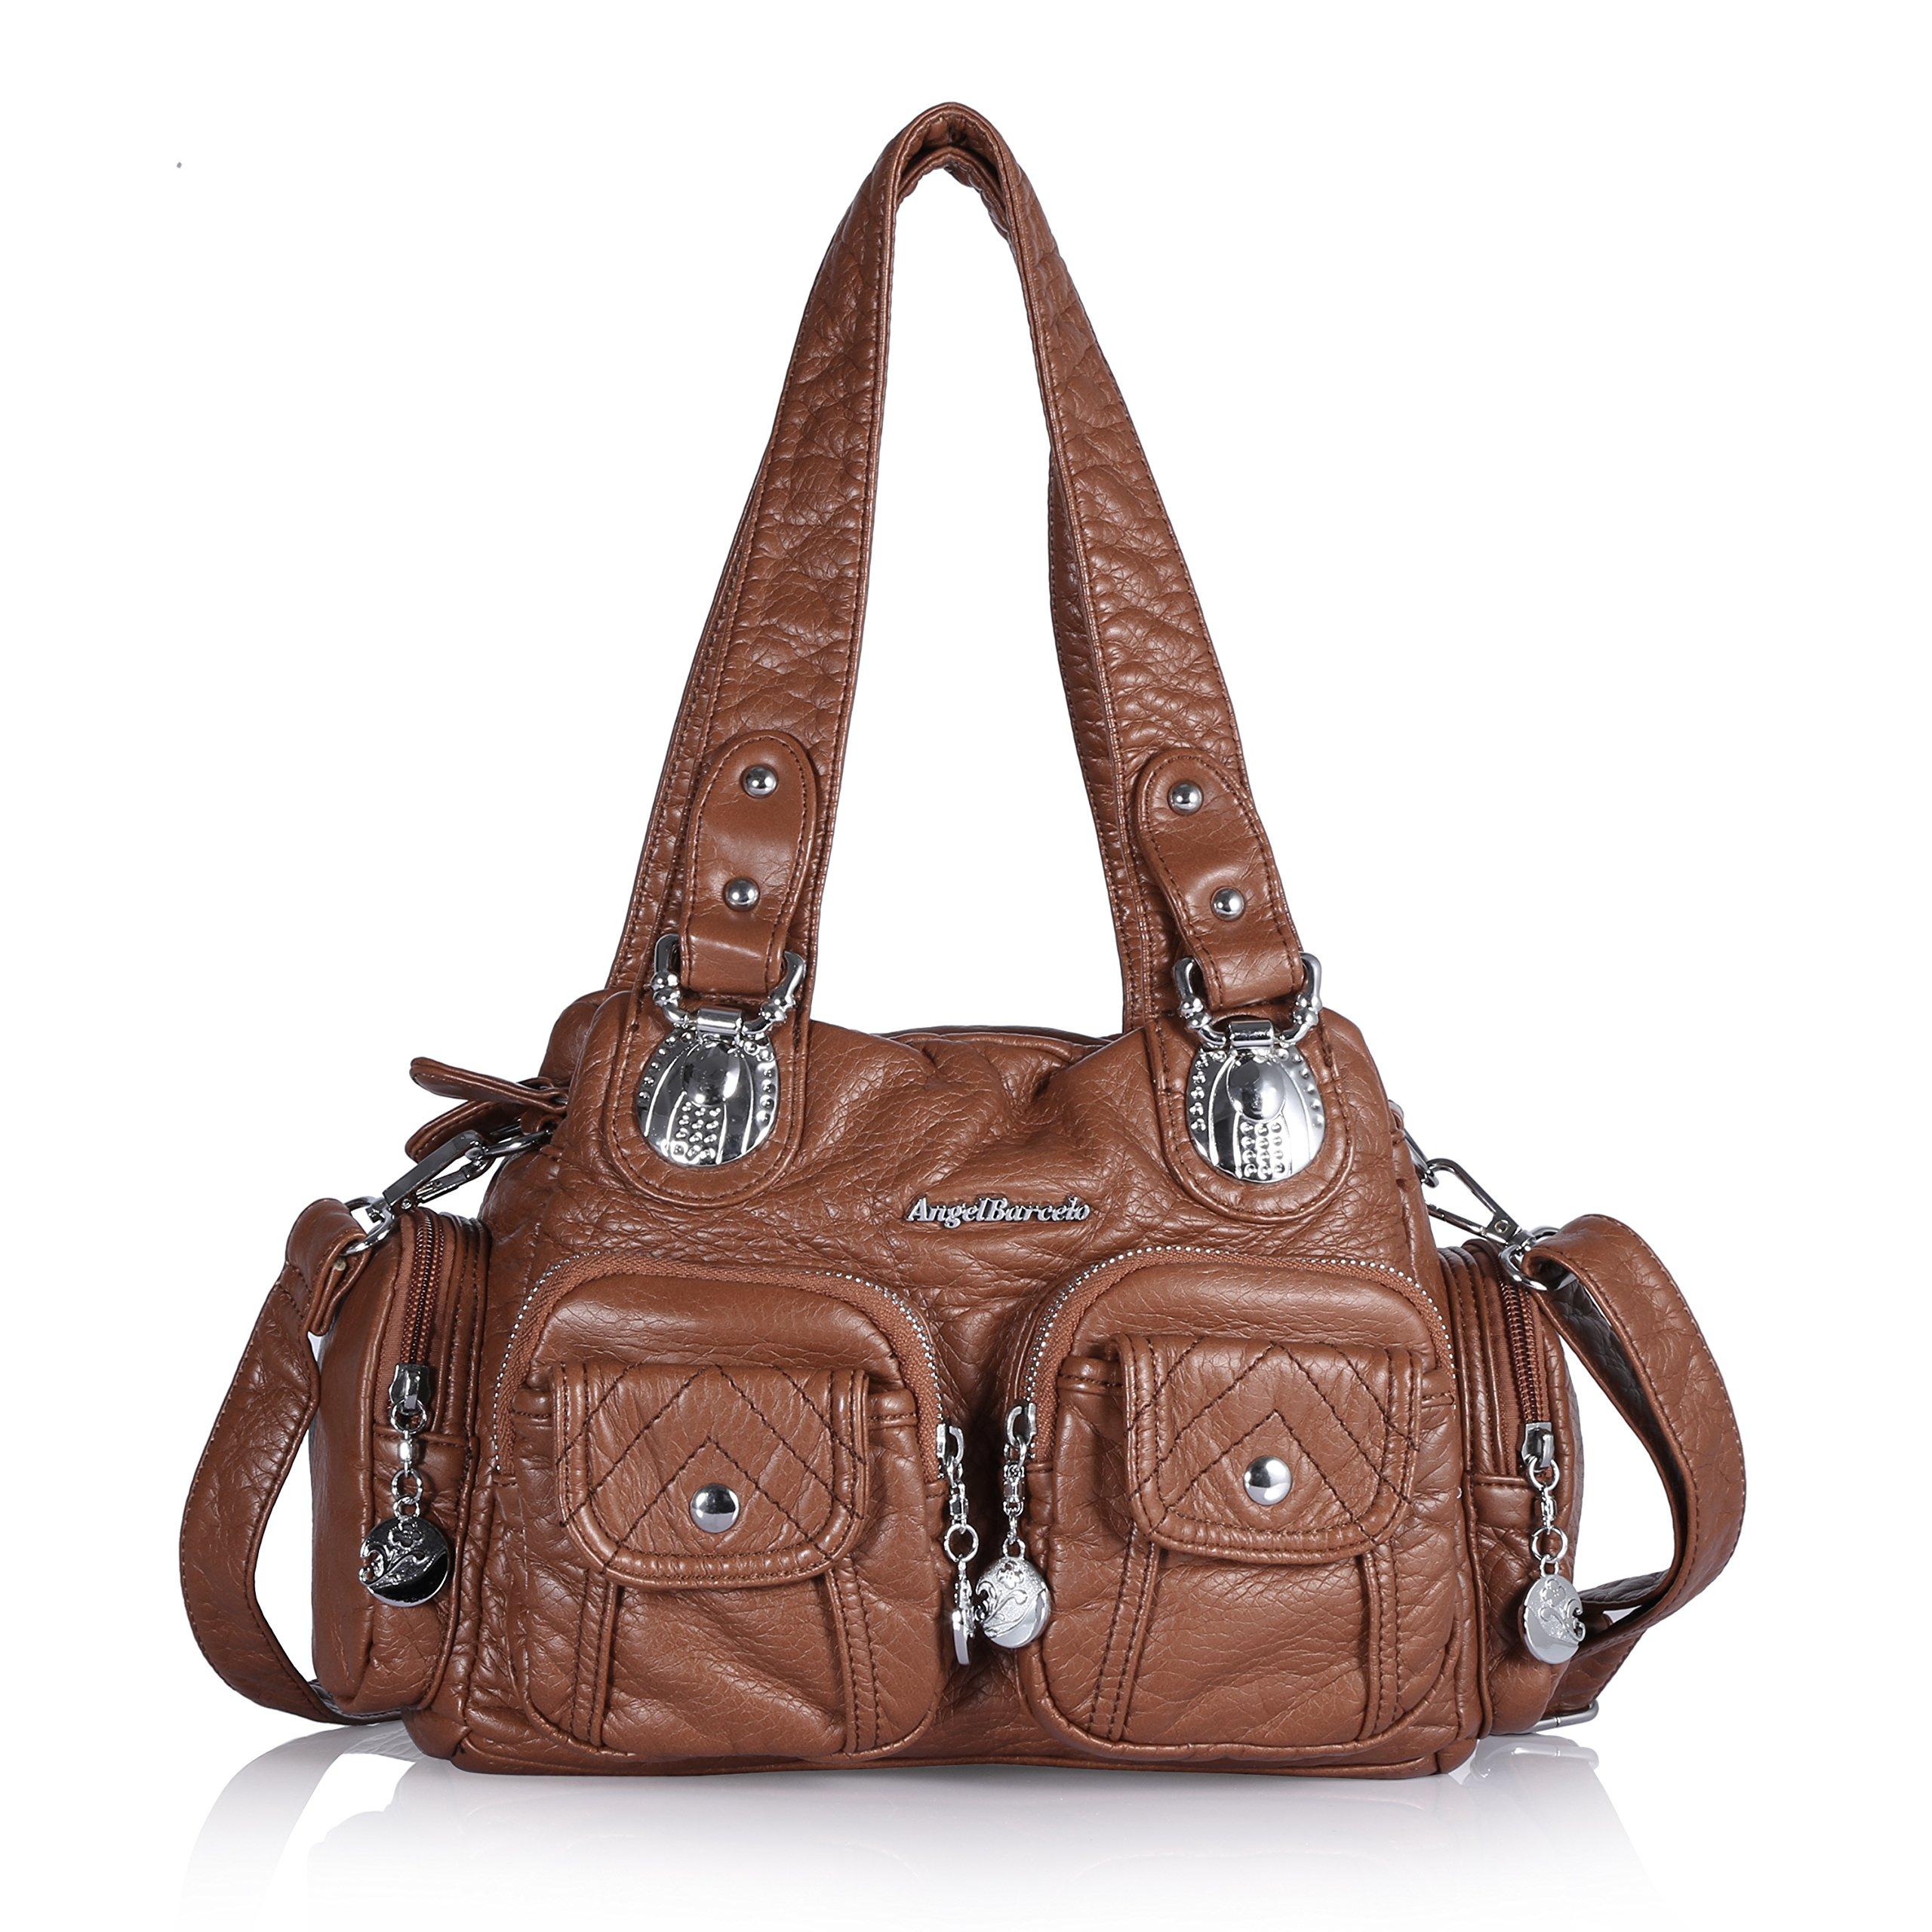 Angel Barcelo 3 Mini Handbags Women Purse PU Leather Top Zippers Multi Pockets Shoulder Bags … (Brown)